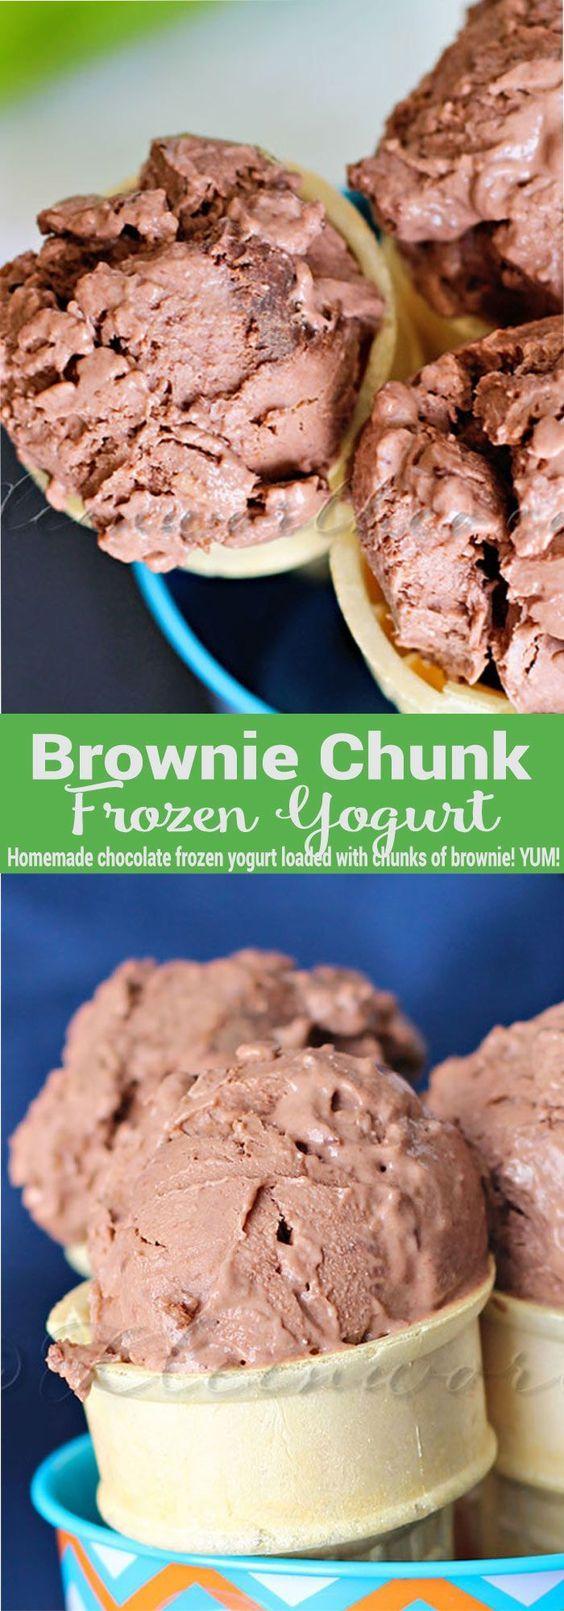 Brownie Chunk Frozen Yogurt -the perfect easy summer dessert. No-bake chocolate treats loaded with brownies makes this no-churn frozen yogurt pure heaven! via @KleinworthCo